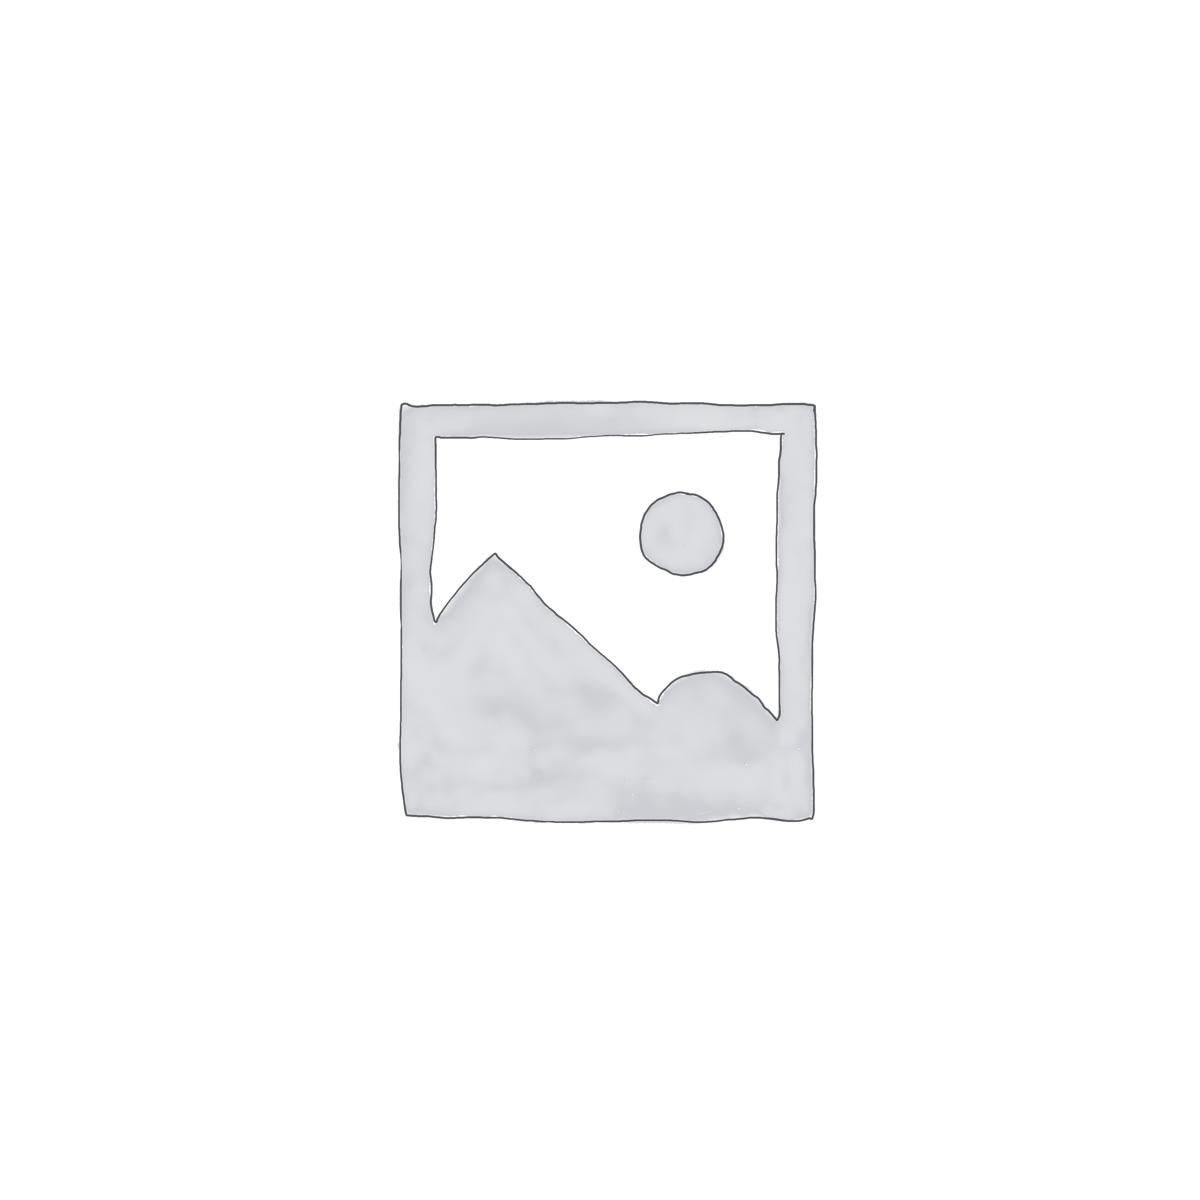 Oil Painting Flowers Wallpaper Mural